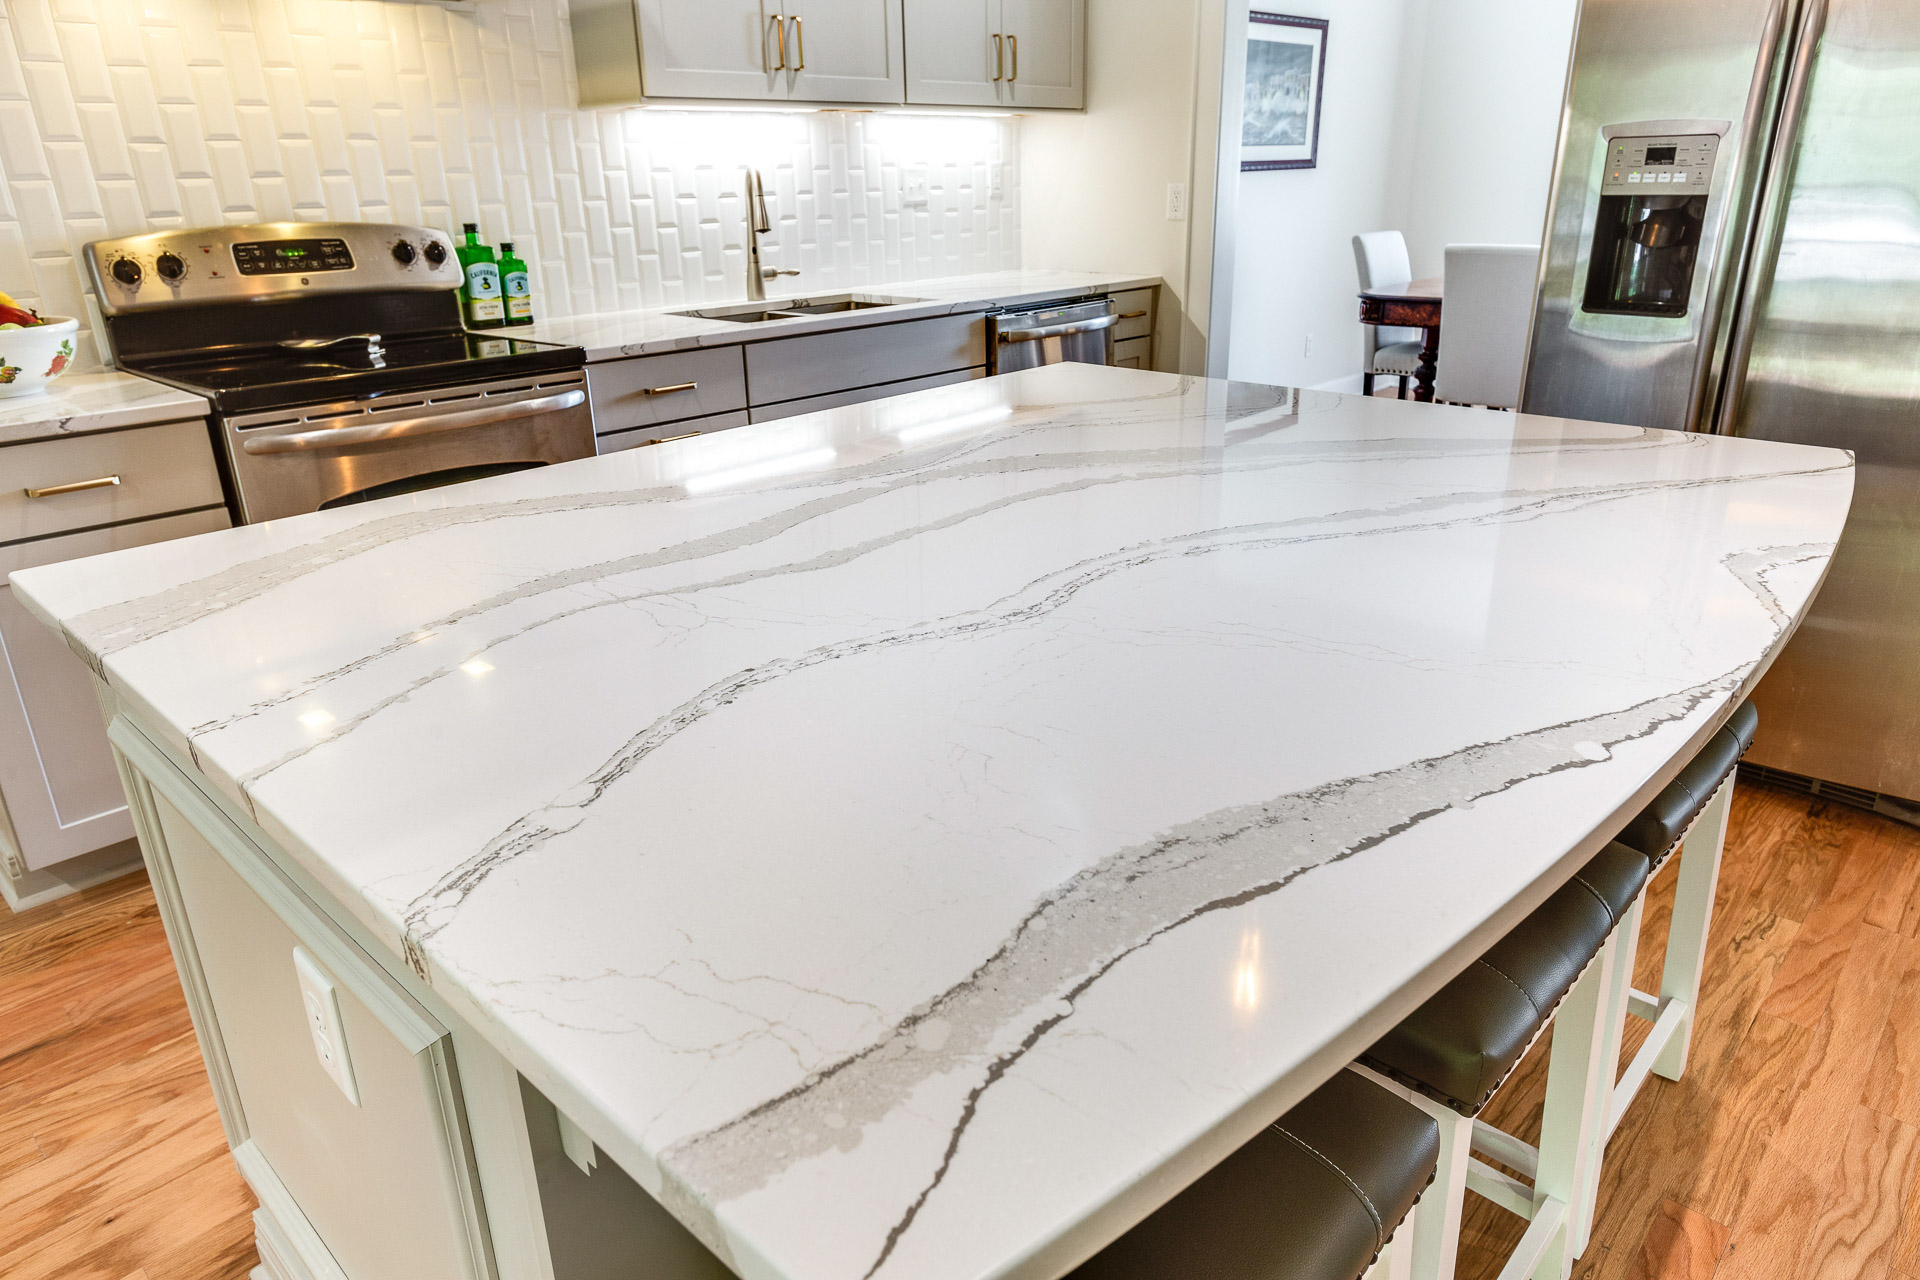 The Cambria Britannica quartz kitchen island countertop is arc shaped in the seating area.